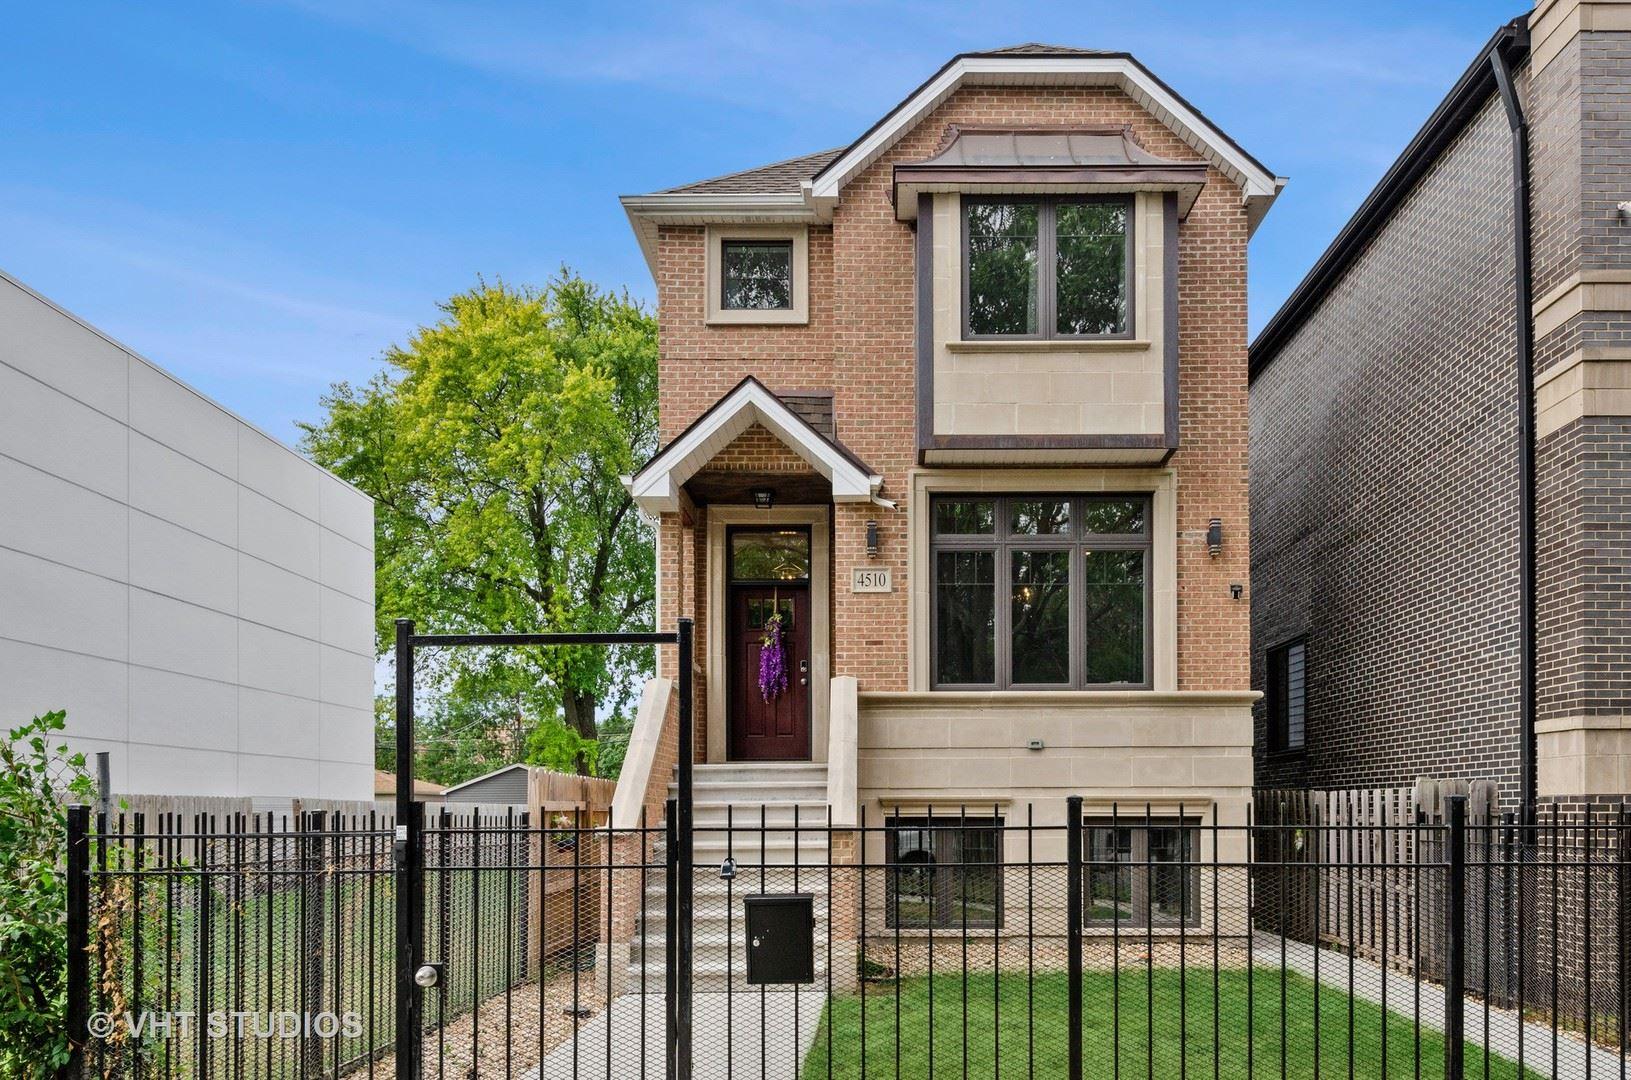 4510 S Prairie Avenue, Chicago, IL 60653 - #: 11241655